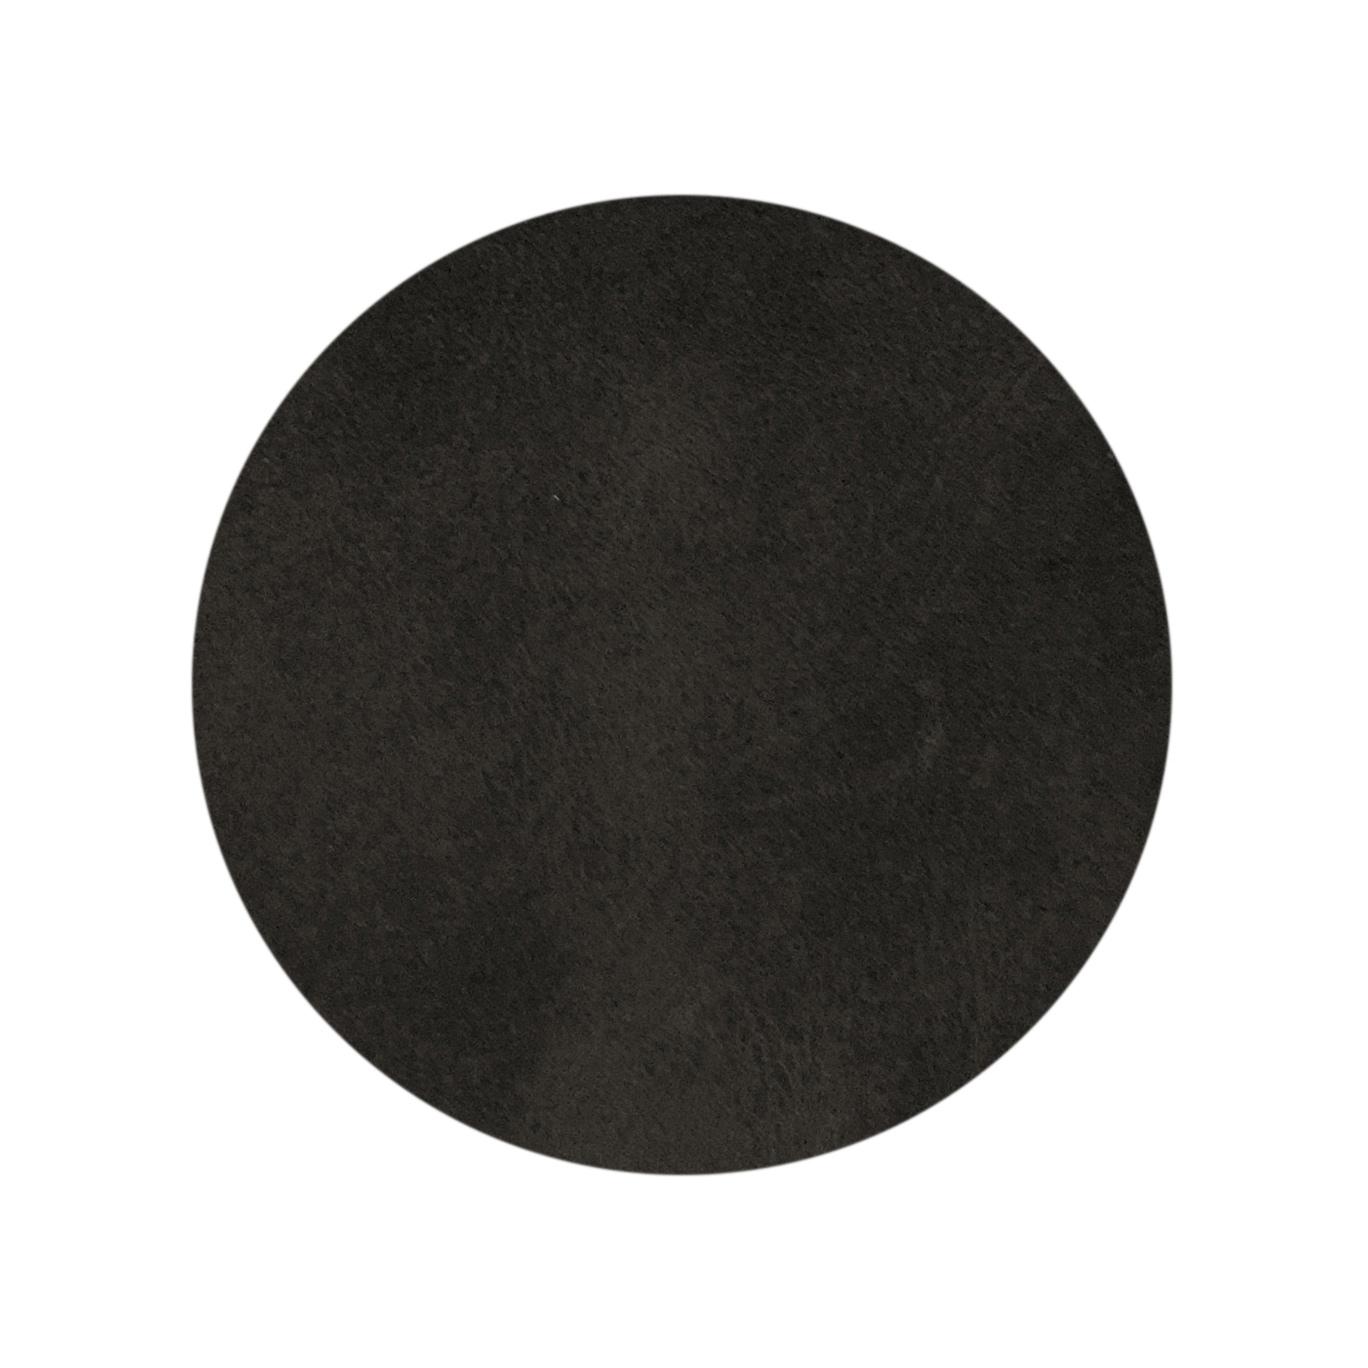 Sierra Leather - Black